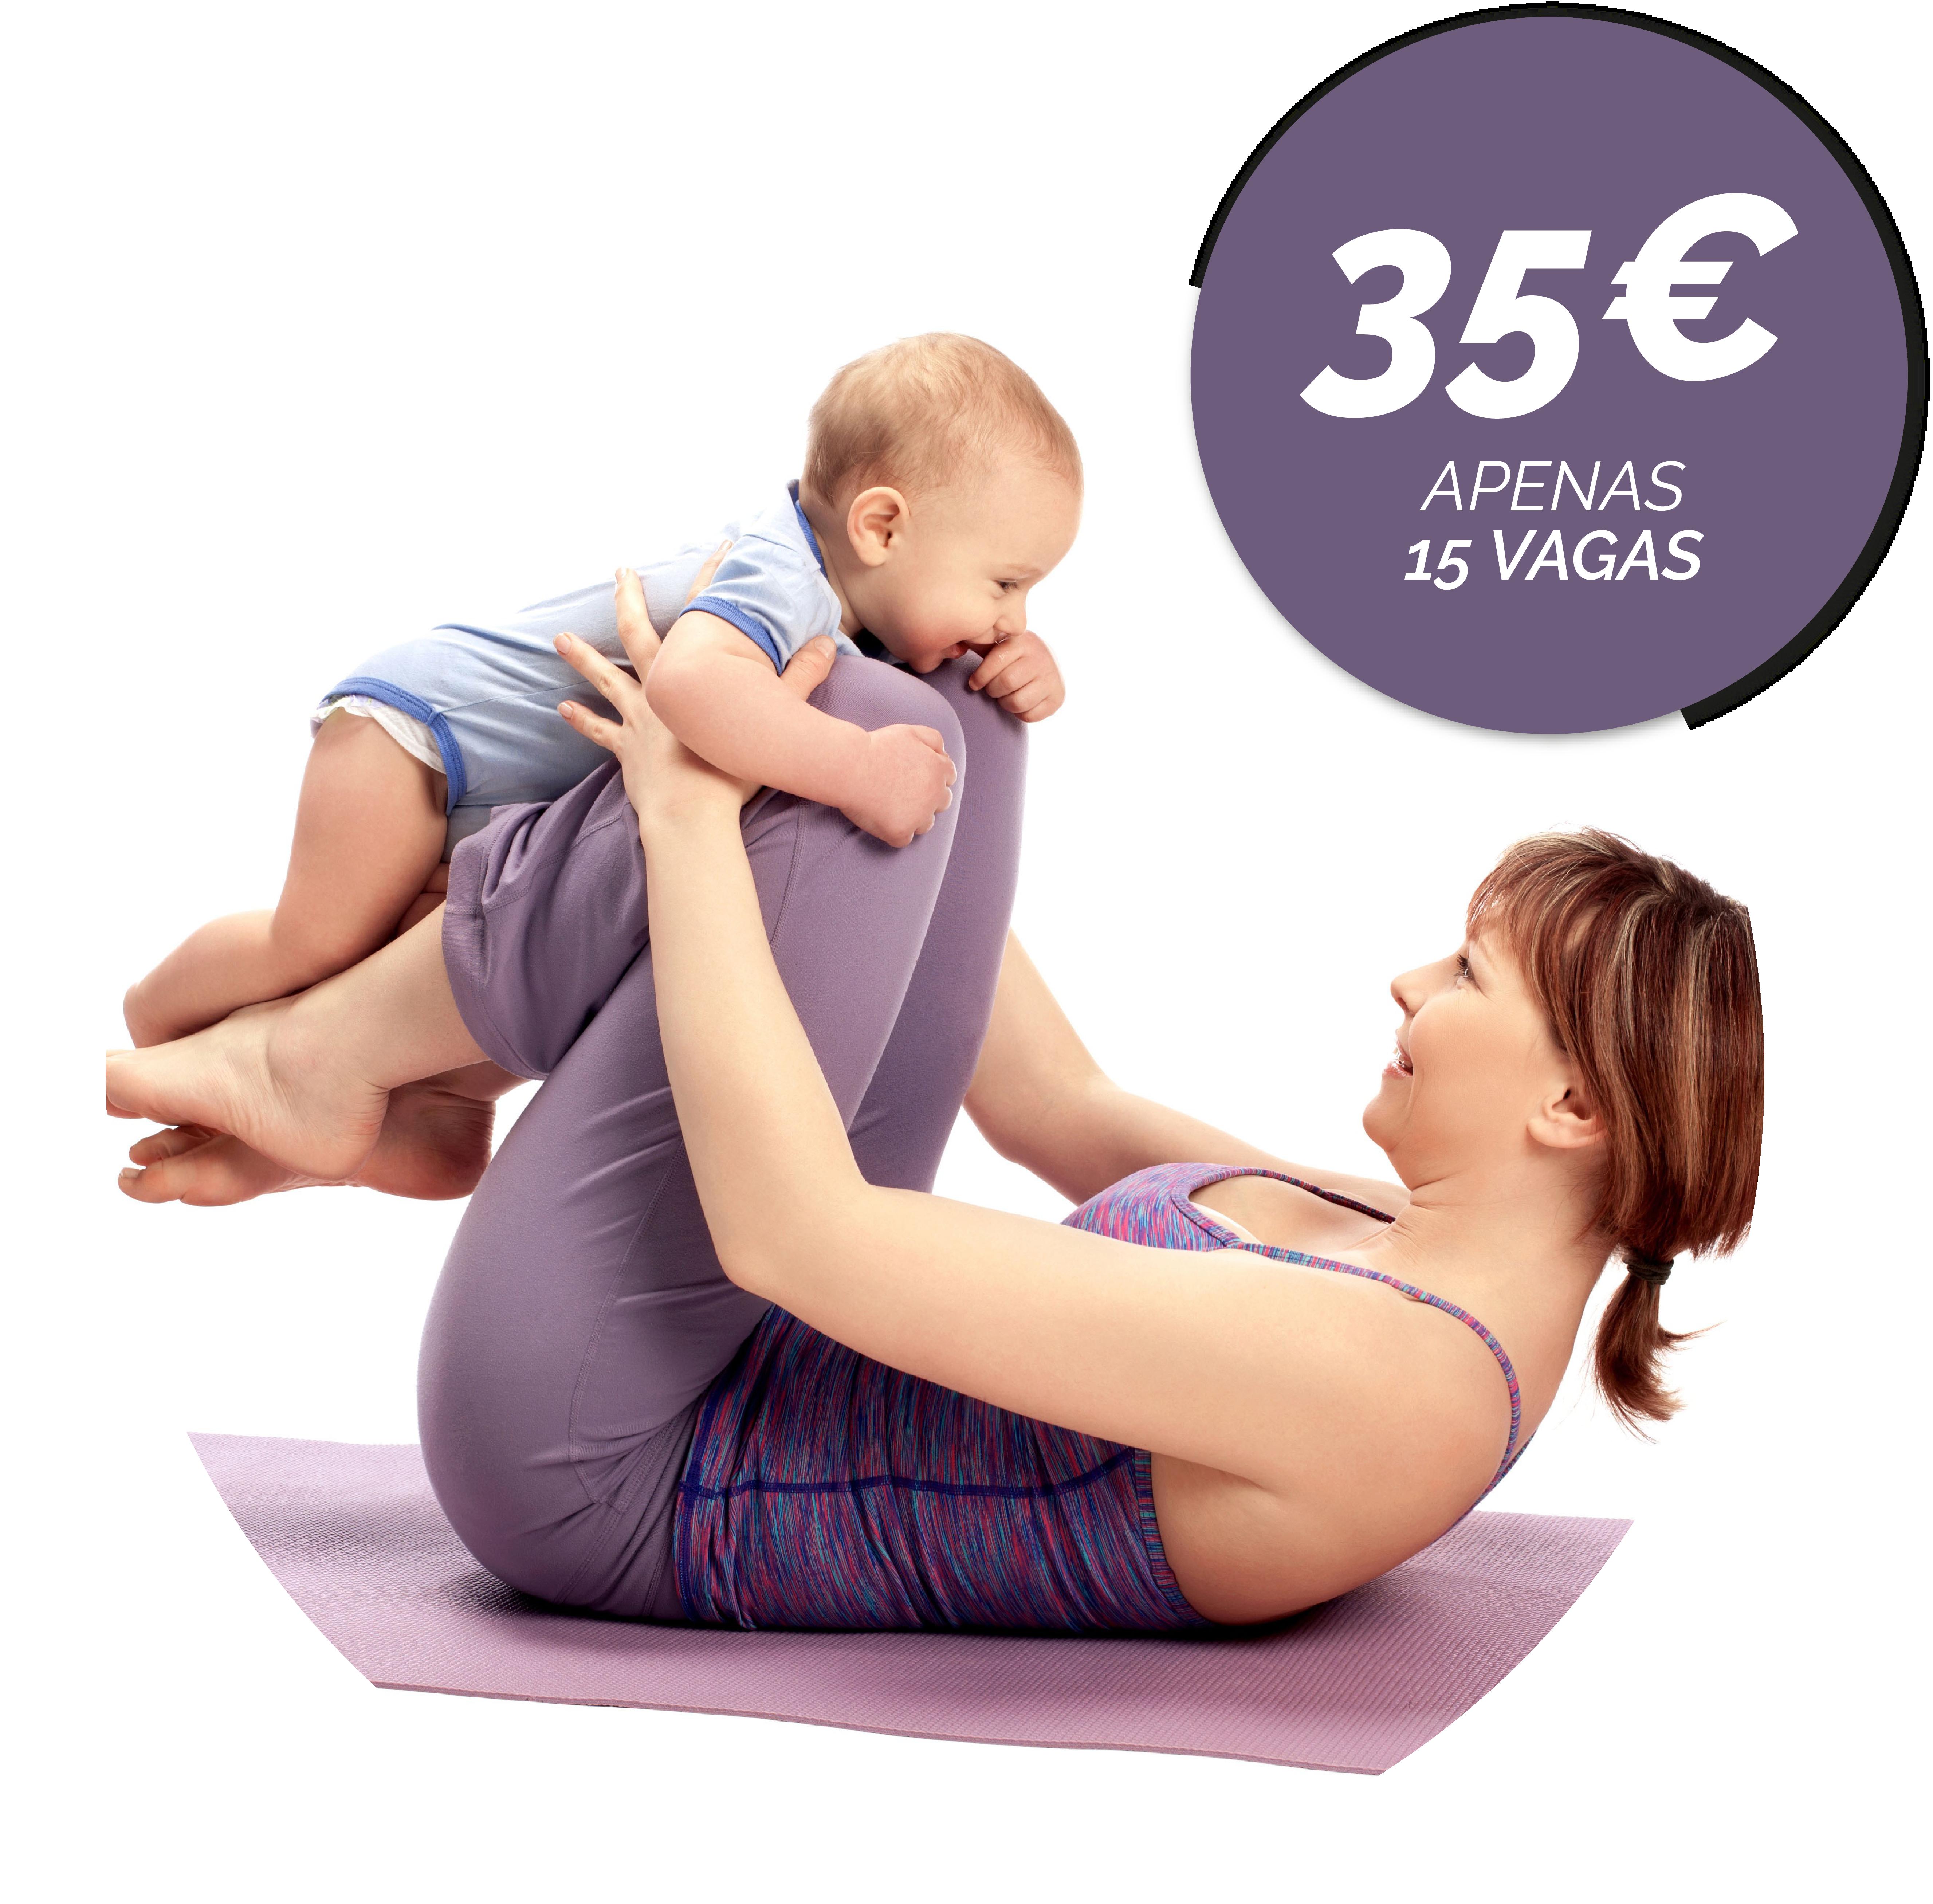 babyyoga 2 - Cursos intensivos: Baby Yoga & Yoga Kids